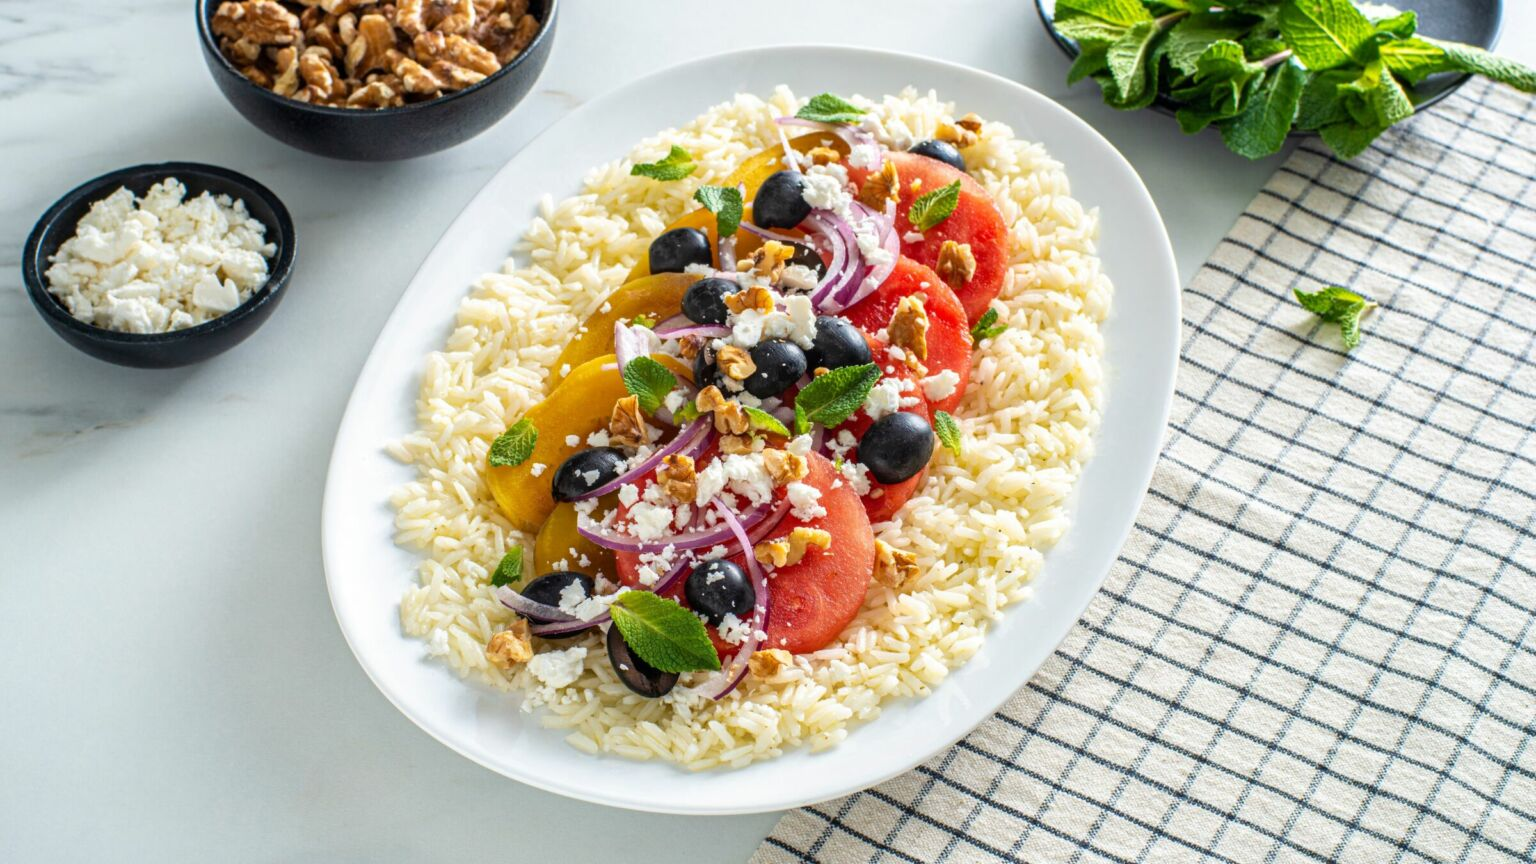 Greek Beet and Watermelon Rice Salad